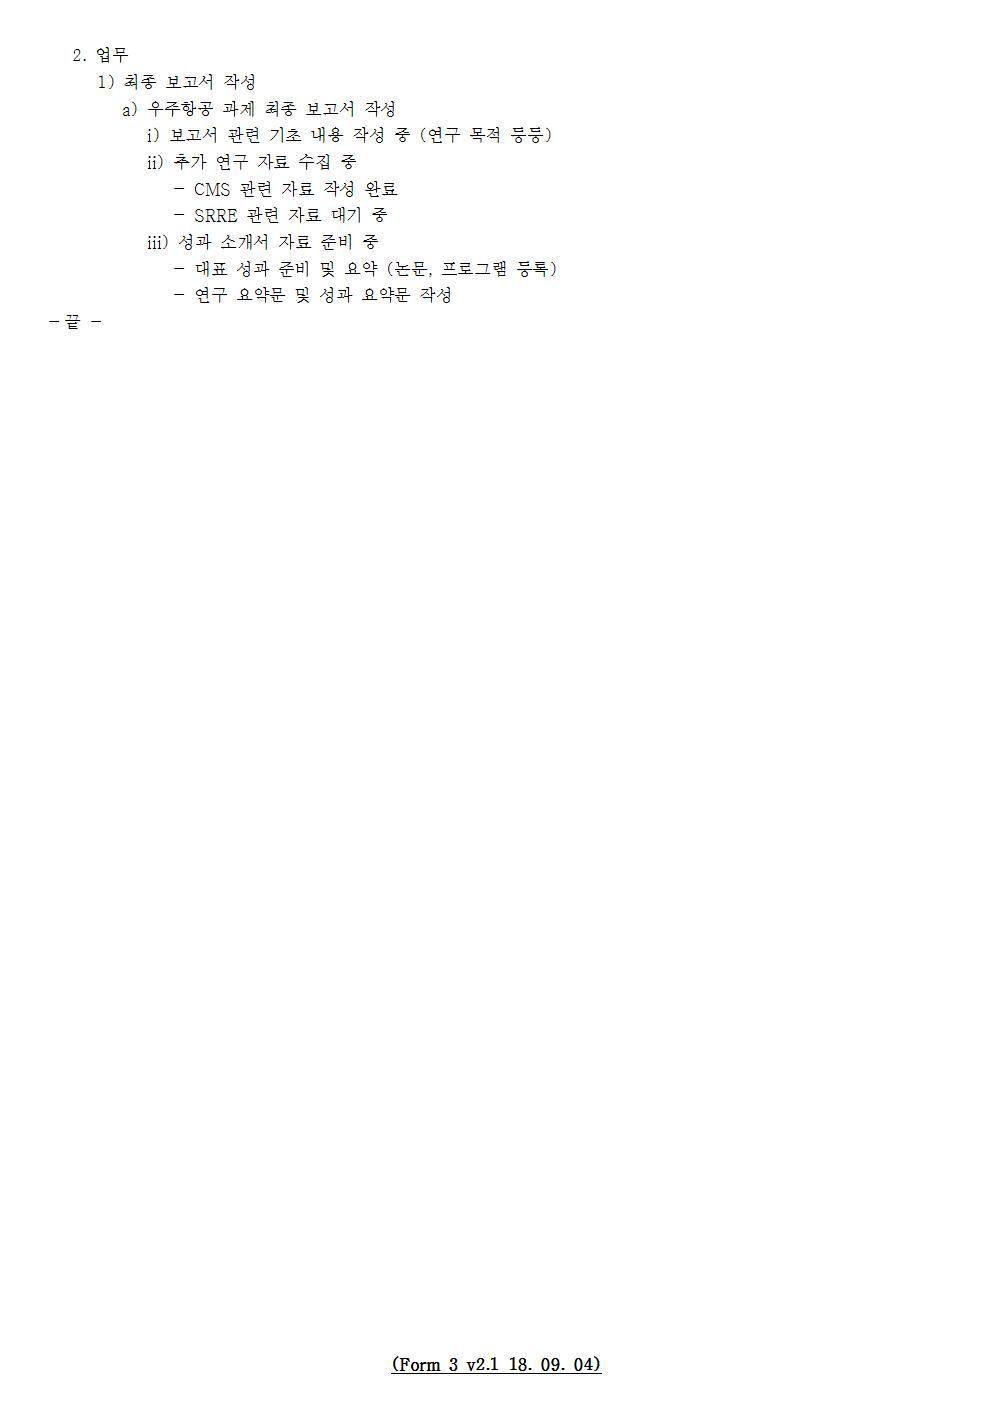 D-[19-005-RD-05]-[final report]-[2019-07-05][YB]-[19-7-1]-[P+D+C]002.jpg